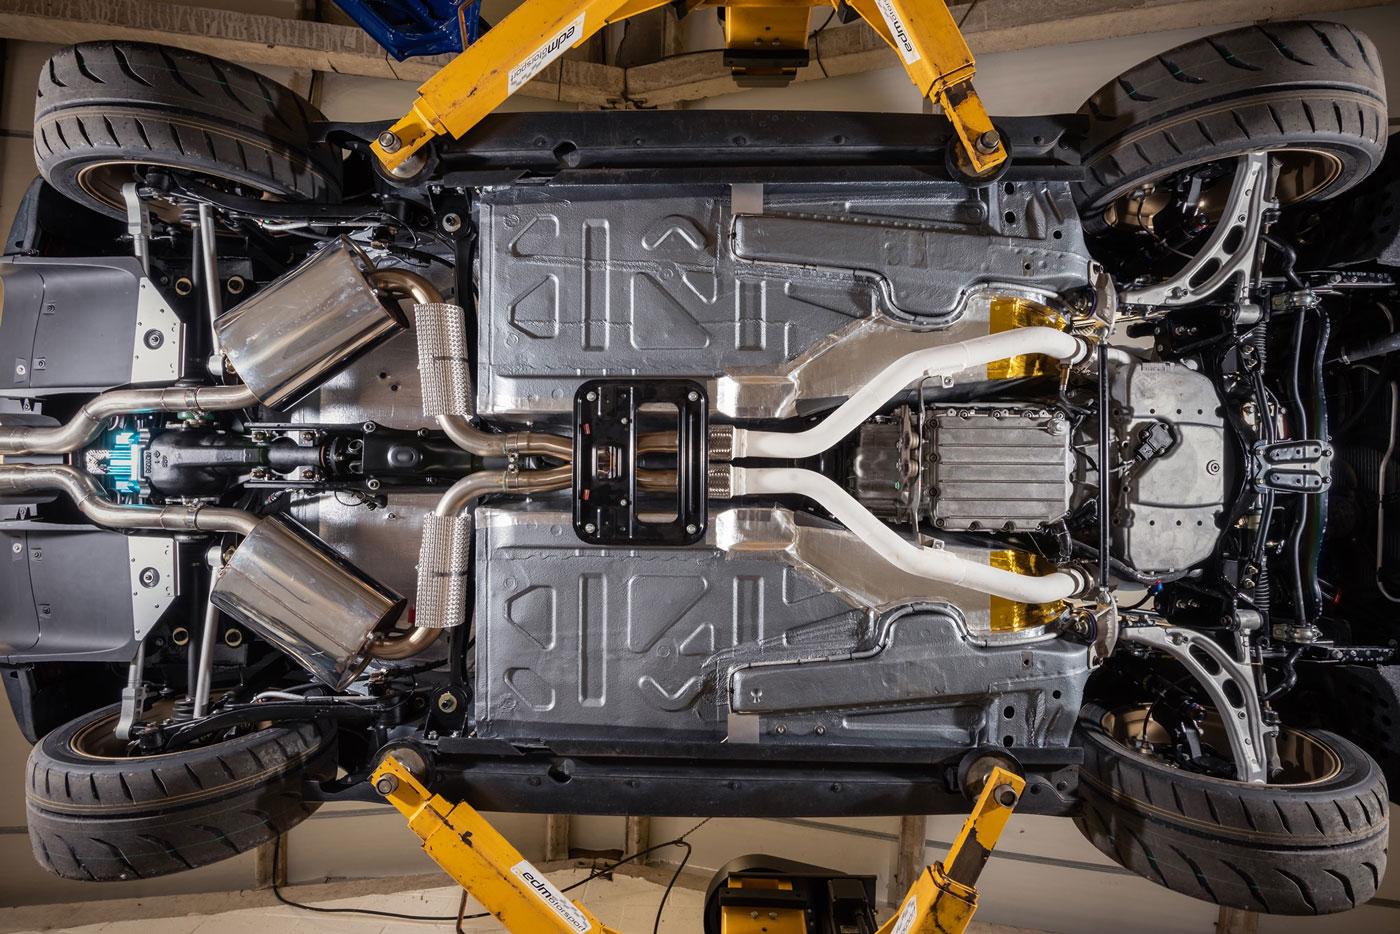 Mini-Vini-BMW-M3-V8-engine-swap-4